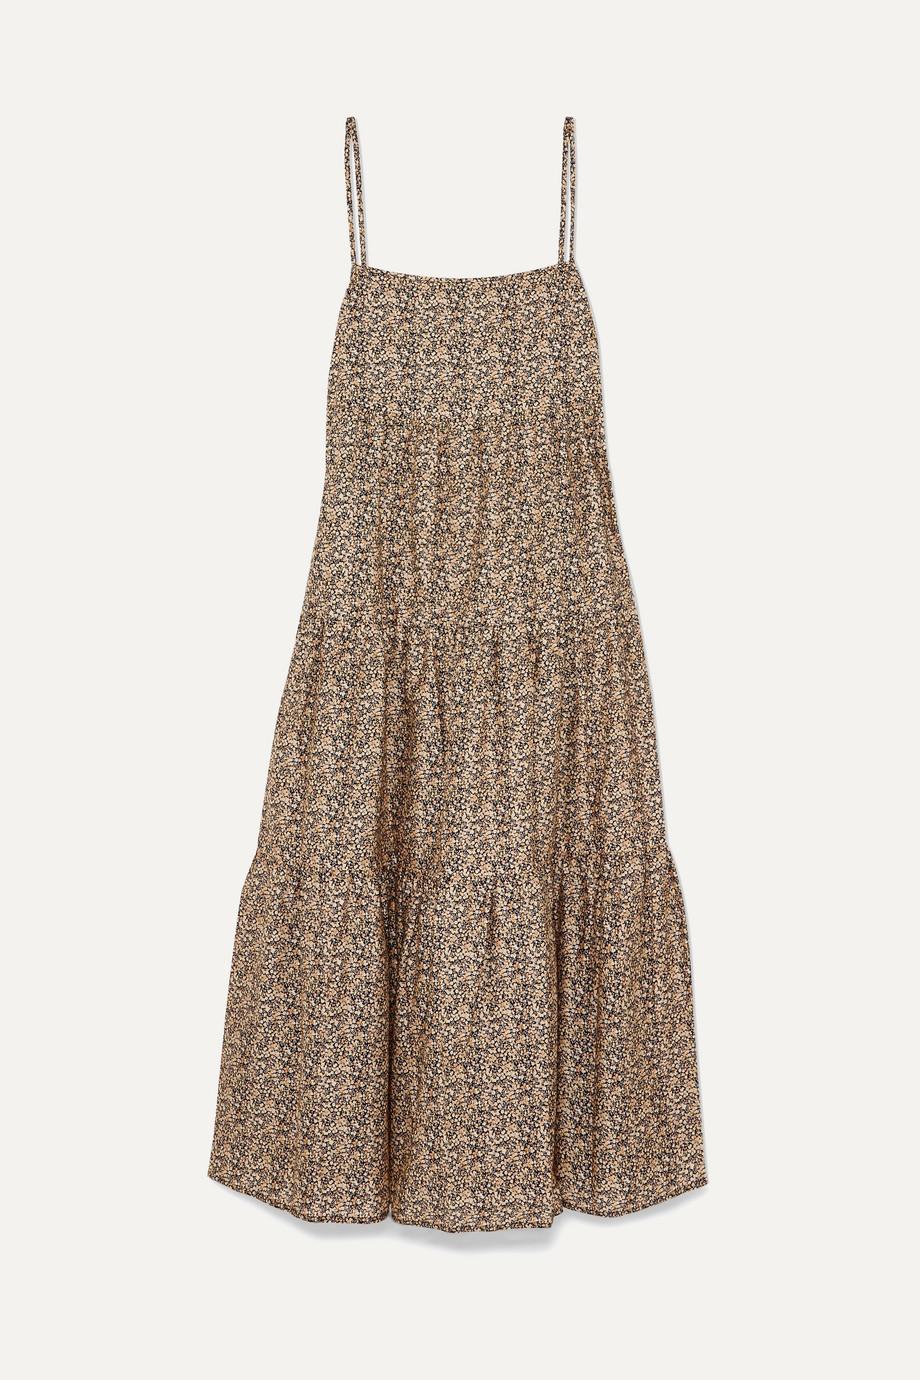 0a5eb8e86cf Matteau Floral-print tiered cotton-poplin maxi dress